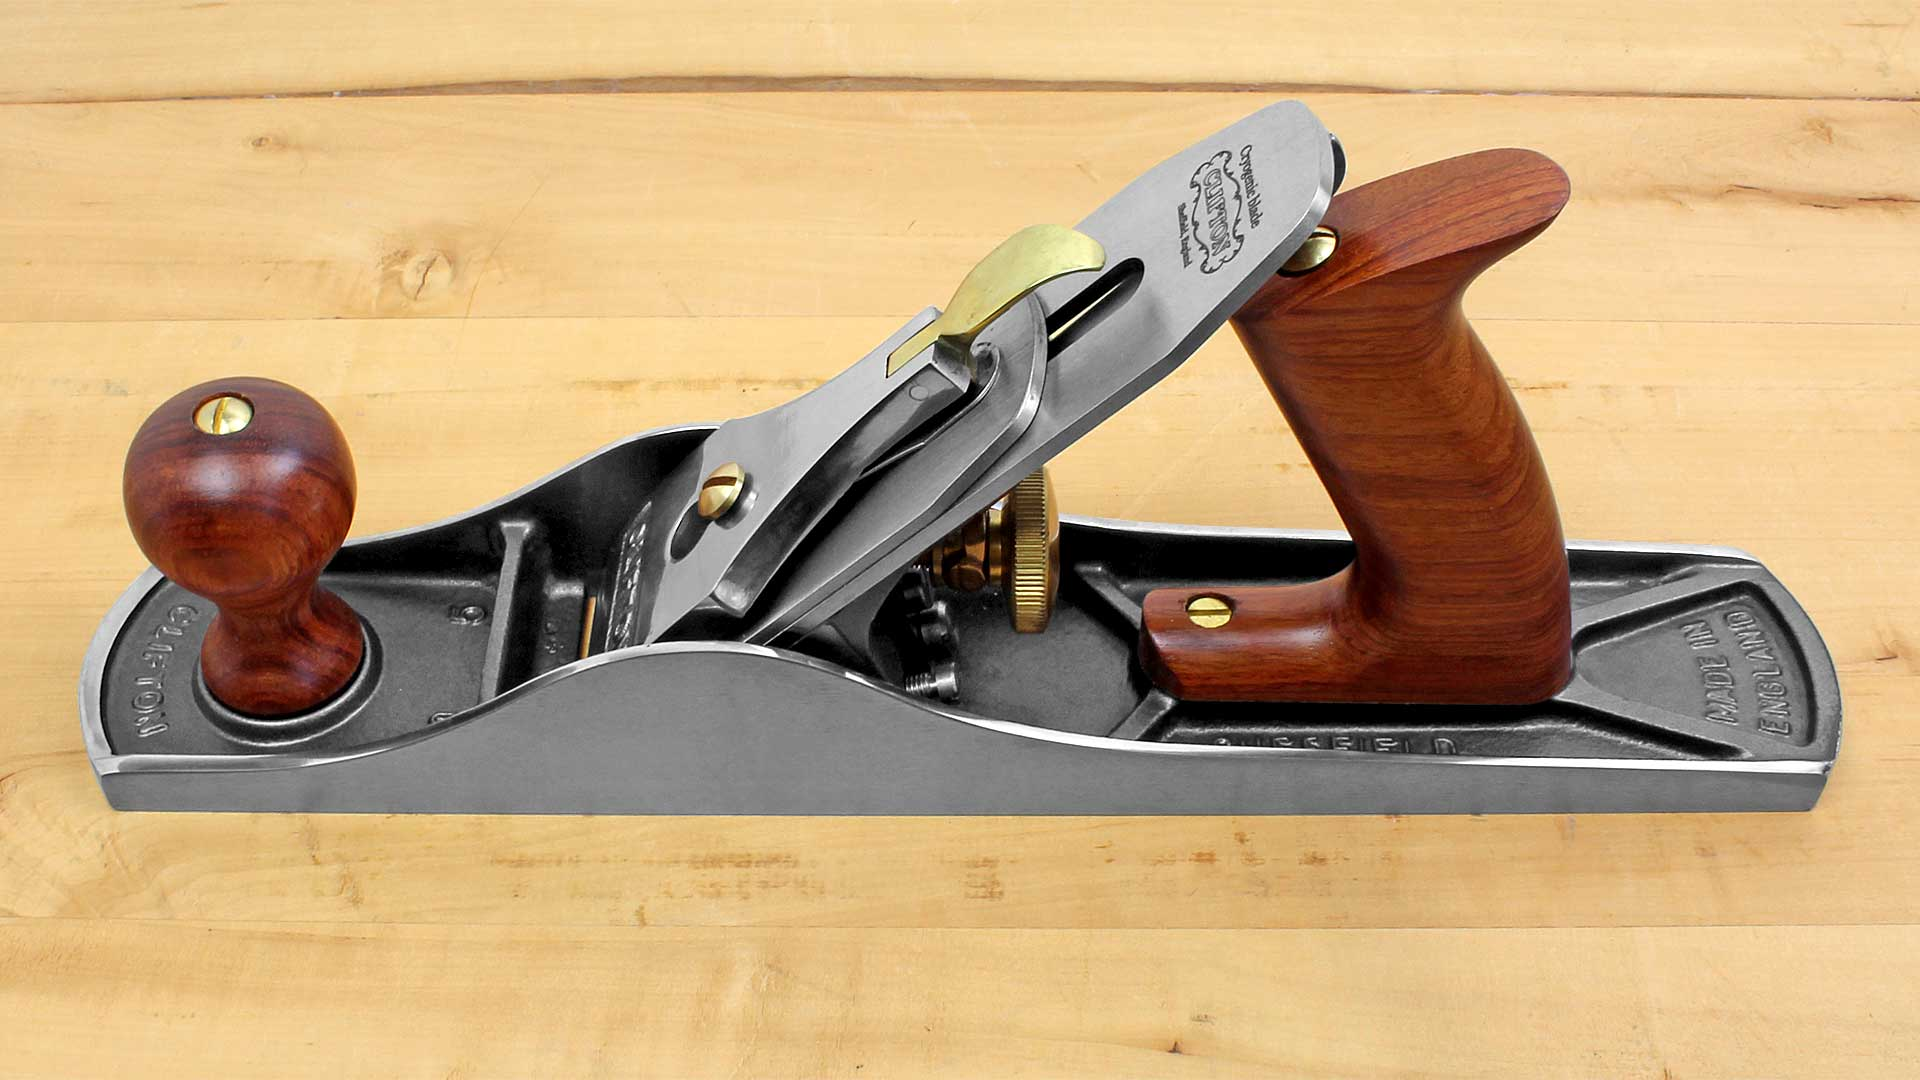 bankhobel no 5 5 1 2 und flachwinkel bankhobel die mittelgro en hobel aus metall. Black Bedroom Furniture Sets. Home Design Ideas